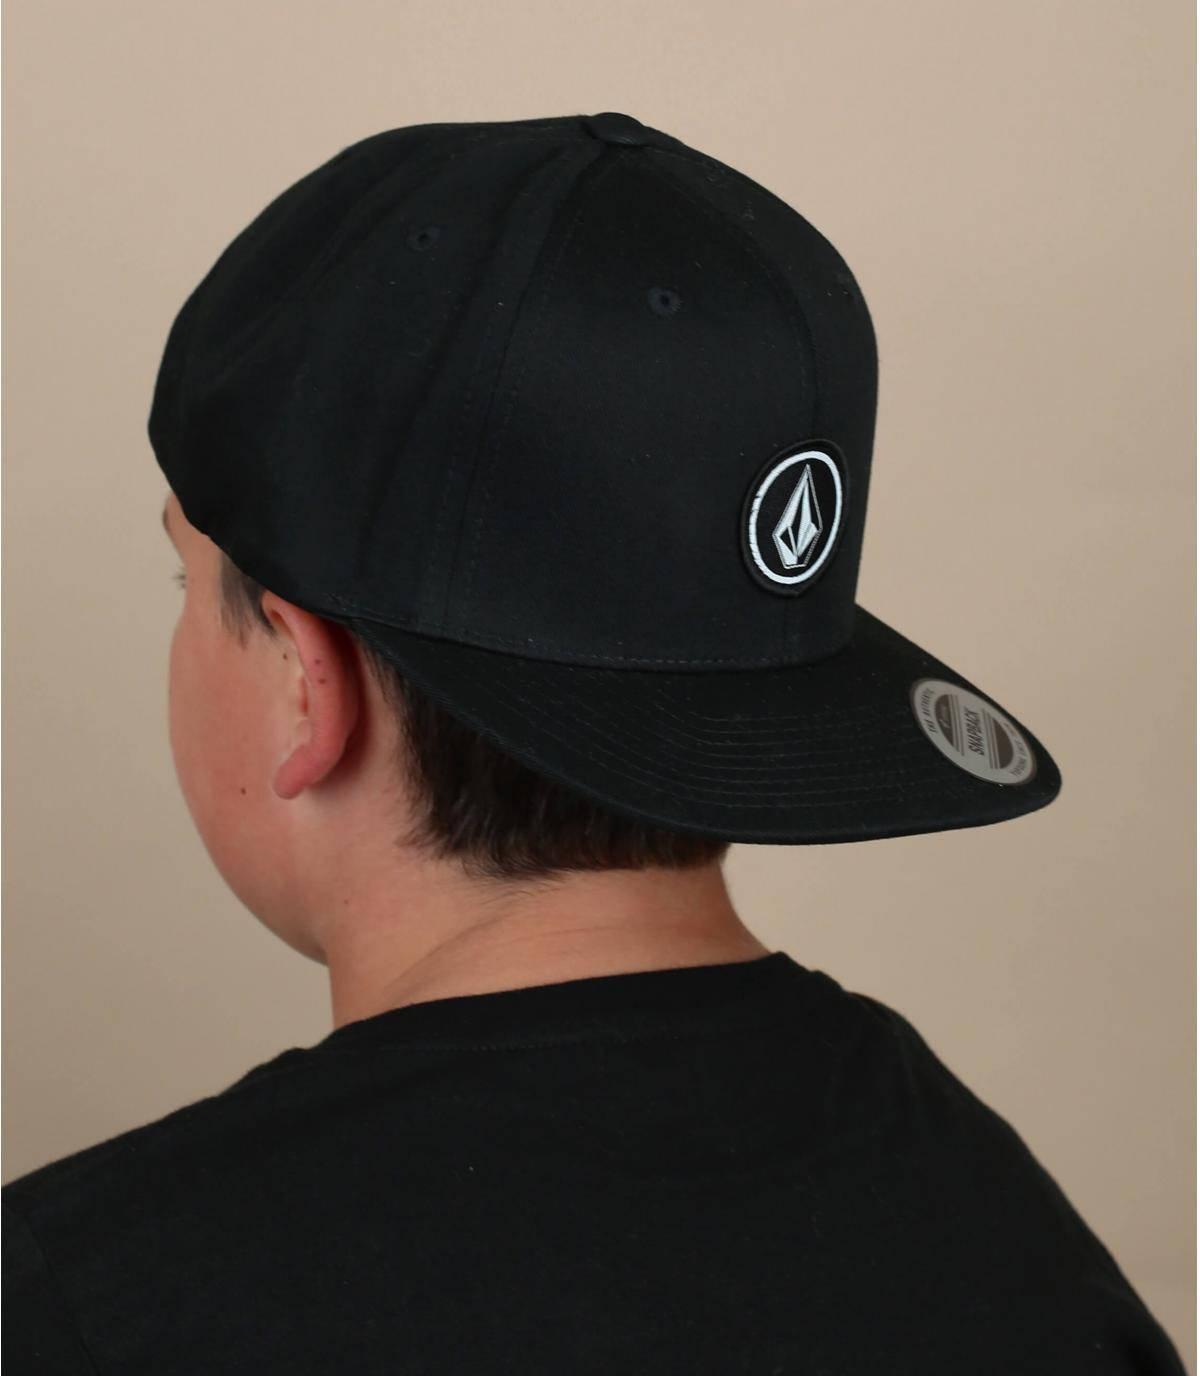 Gorra niño Volcom negra